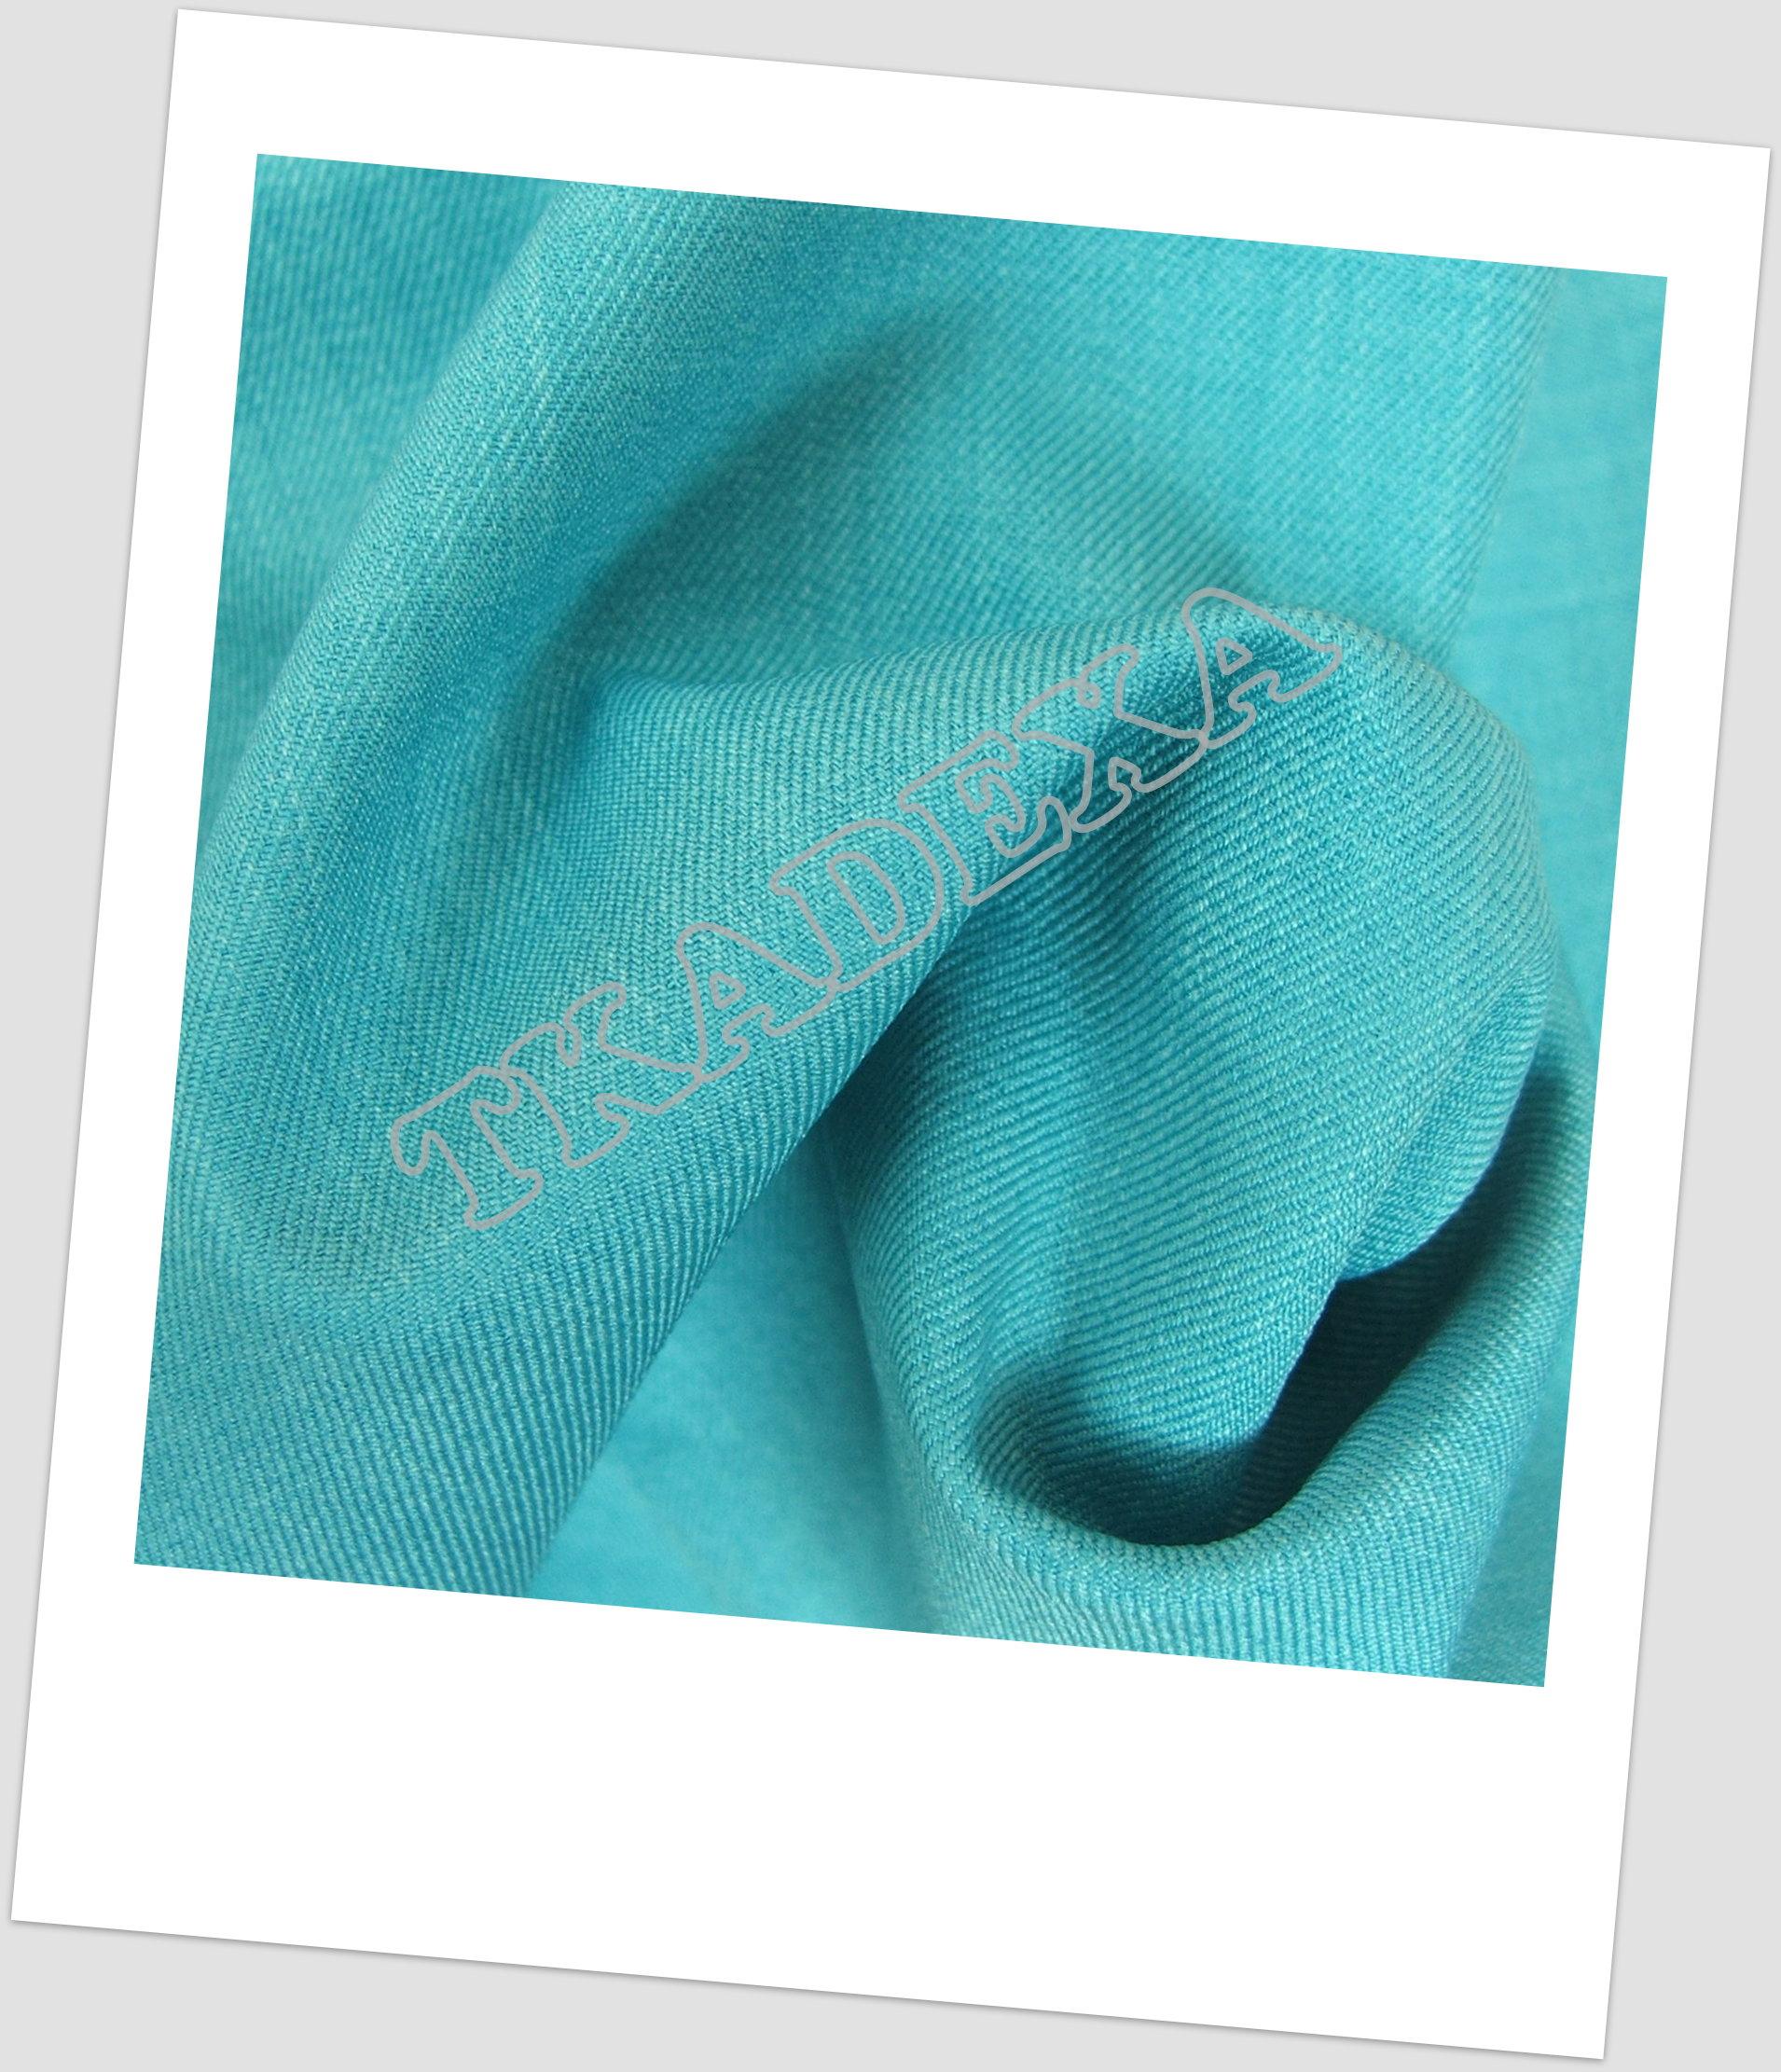 Softshell letní 10 3b -TYRKYS od 5m  58bfb82c1f